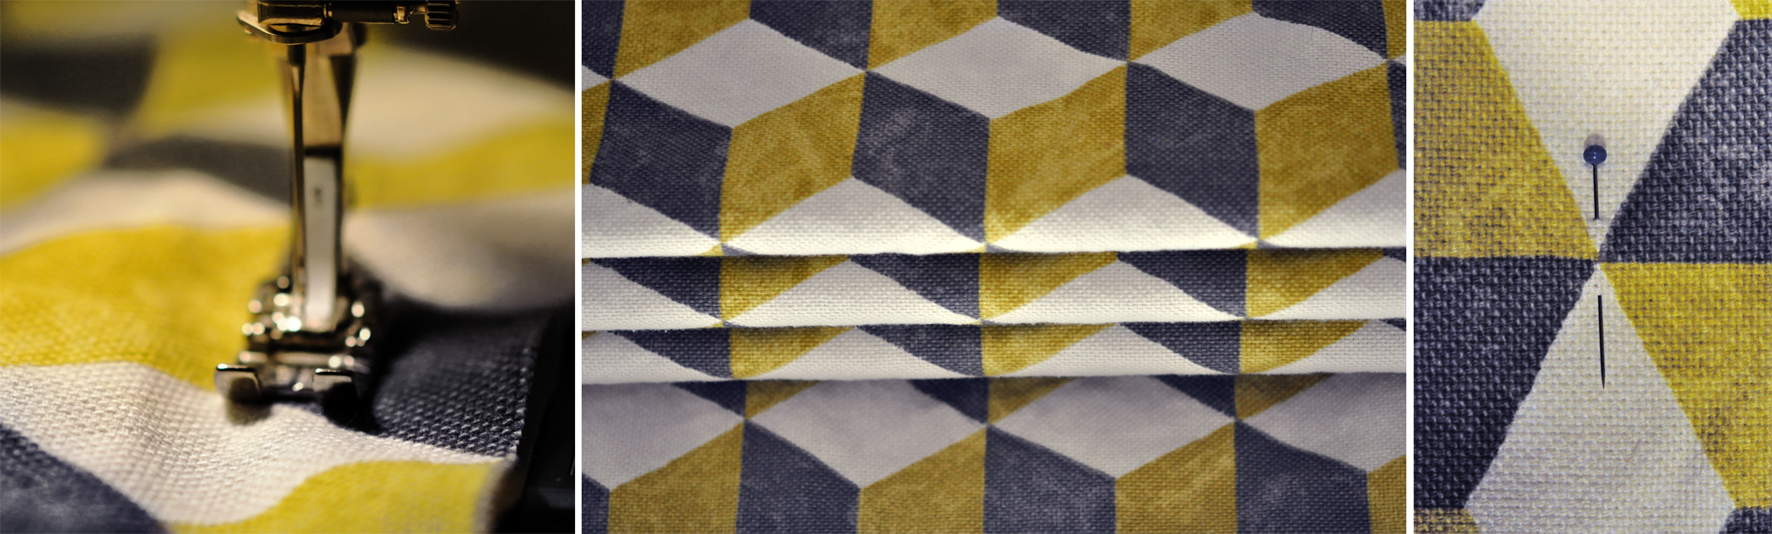 Roman Blind Sewing. Dougie Scott